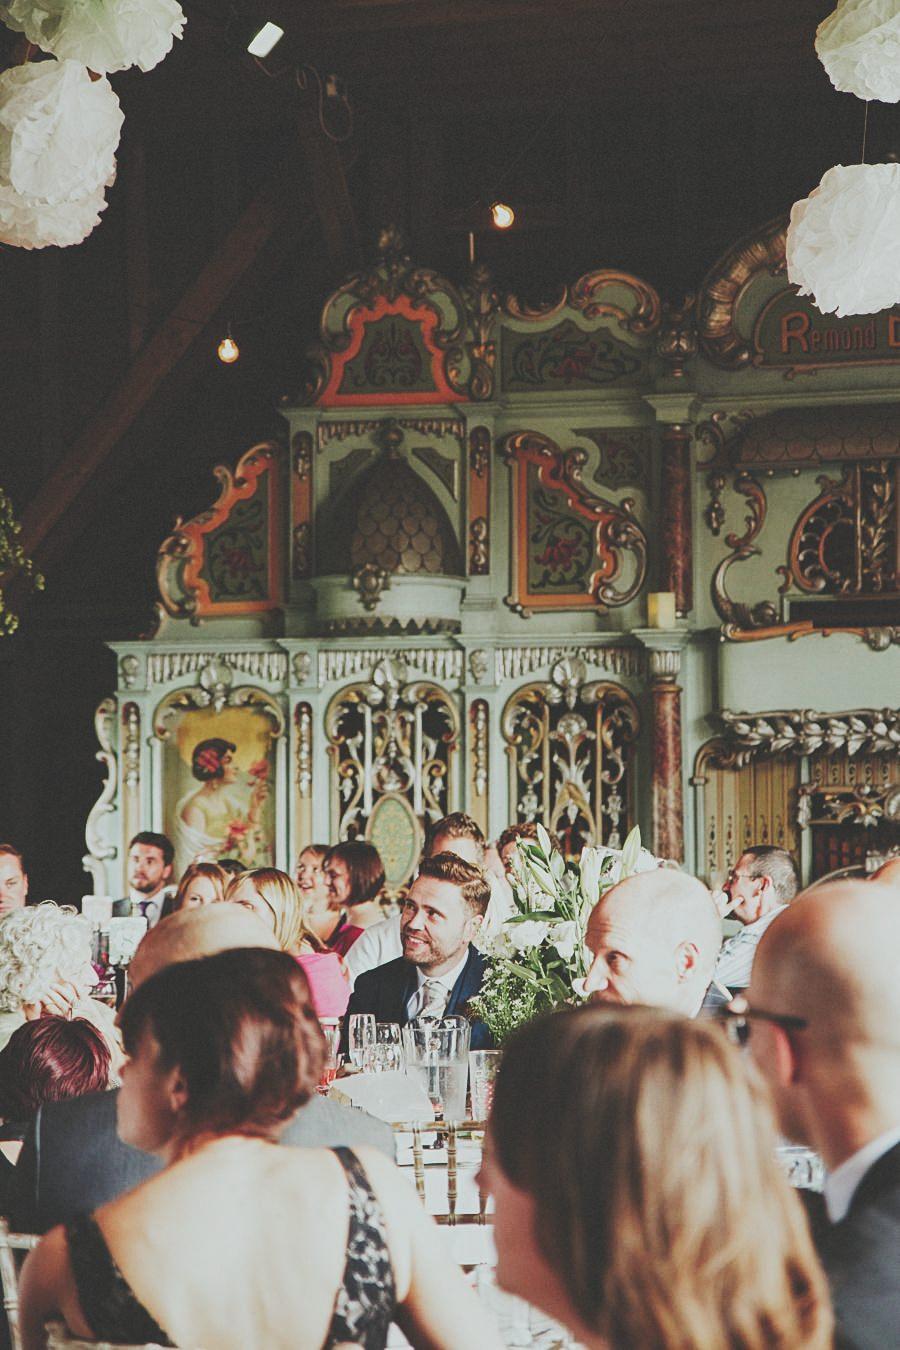 preston-court-wedding-photograph-kent--65.jpg